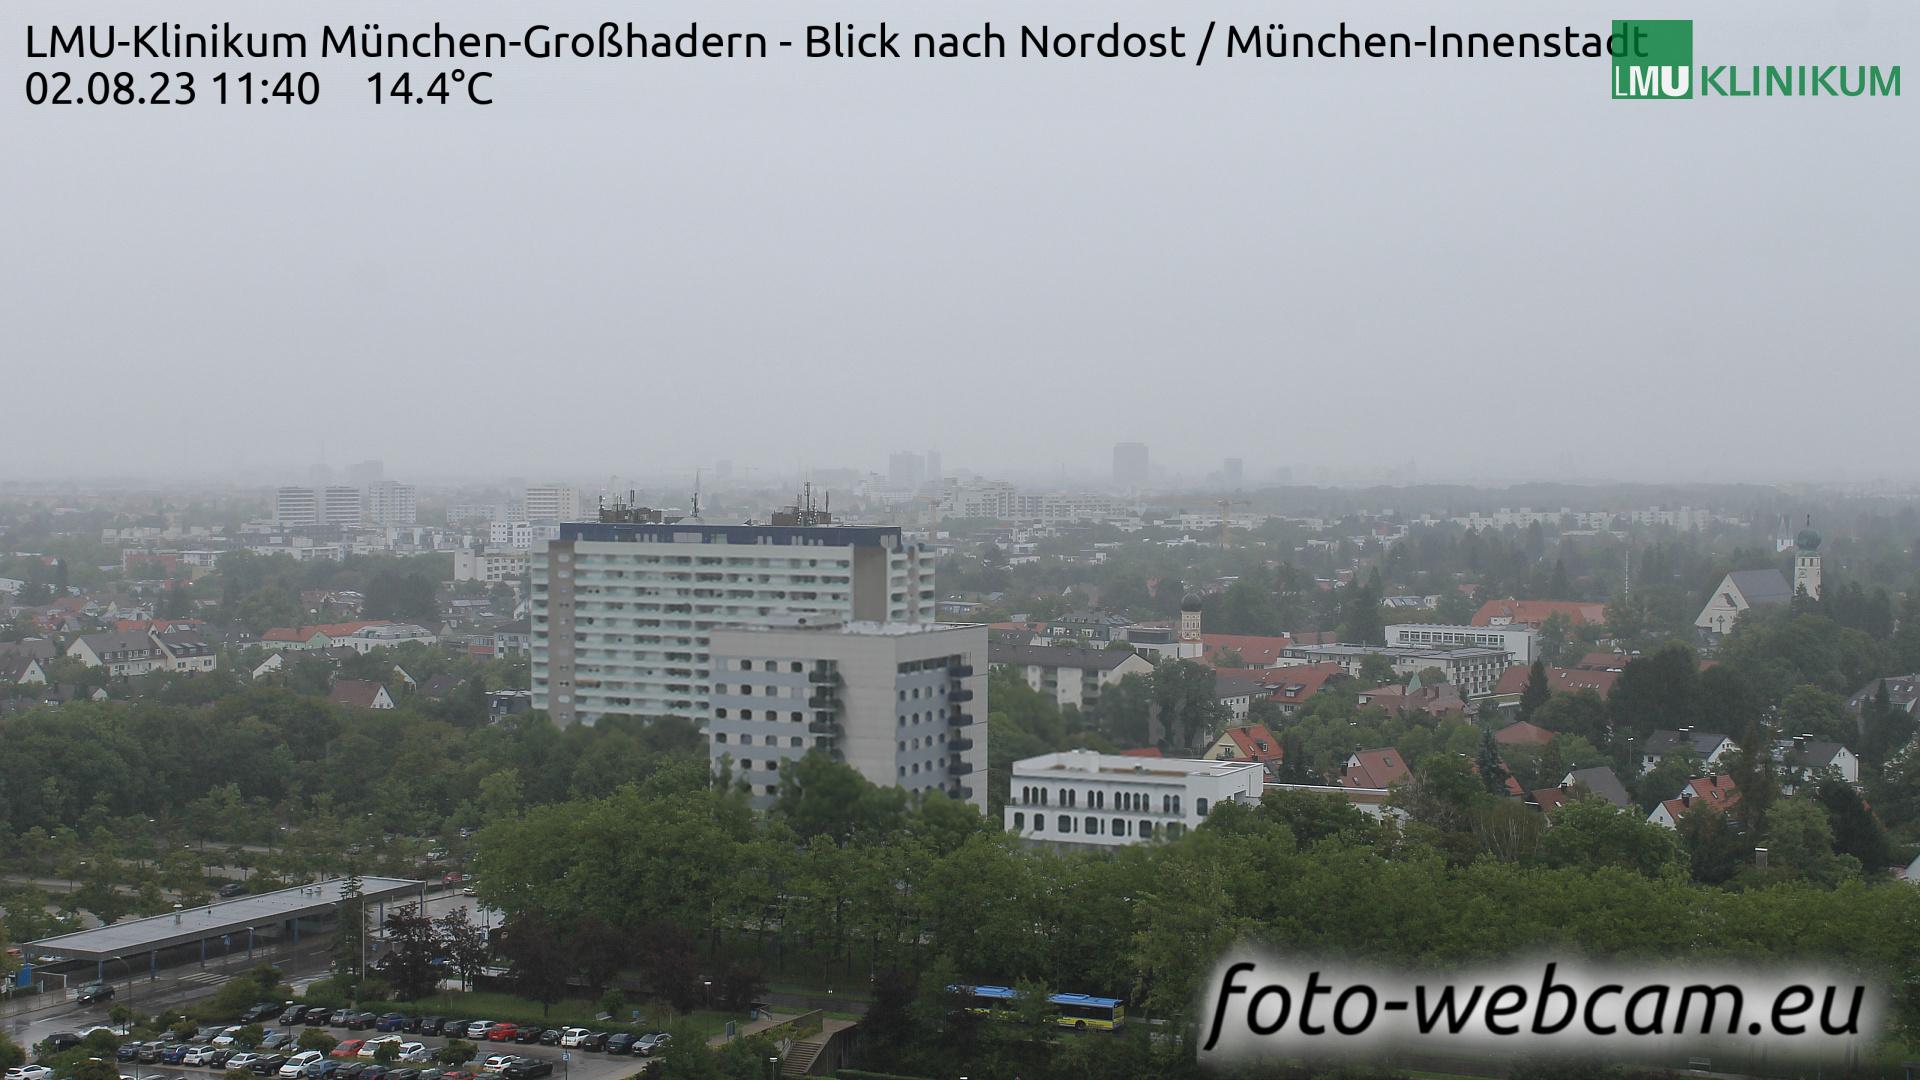 Munich Mon. 11:47